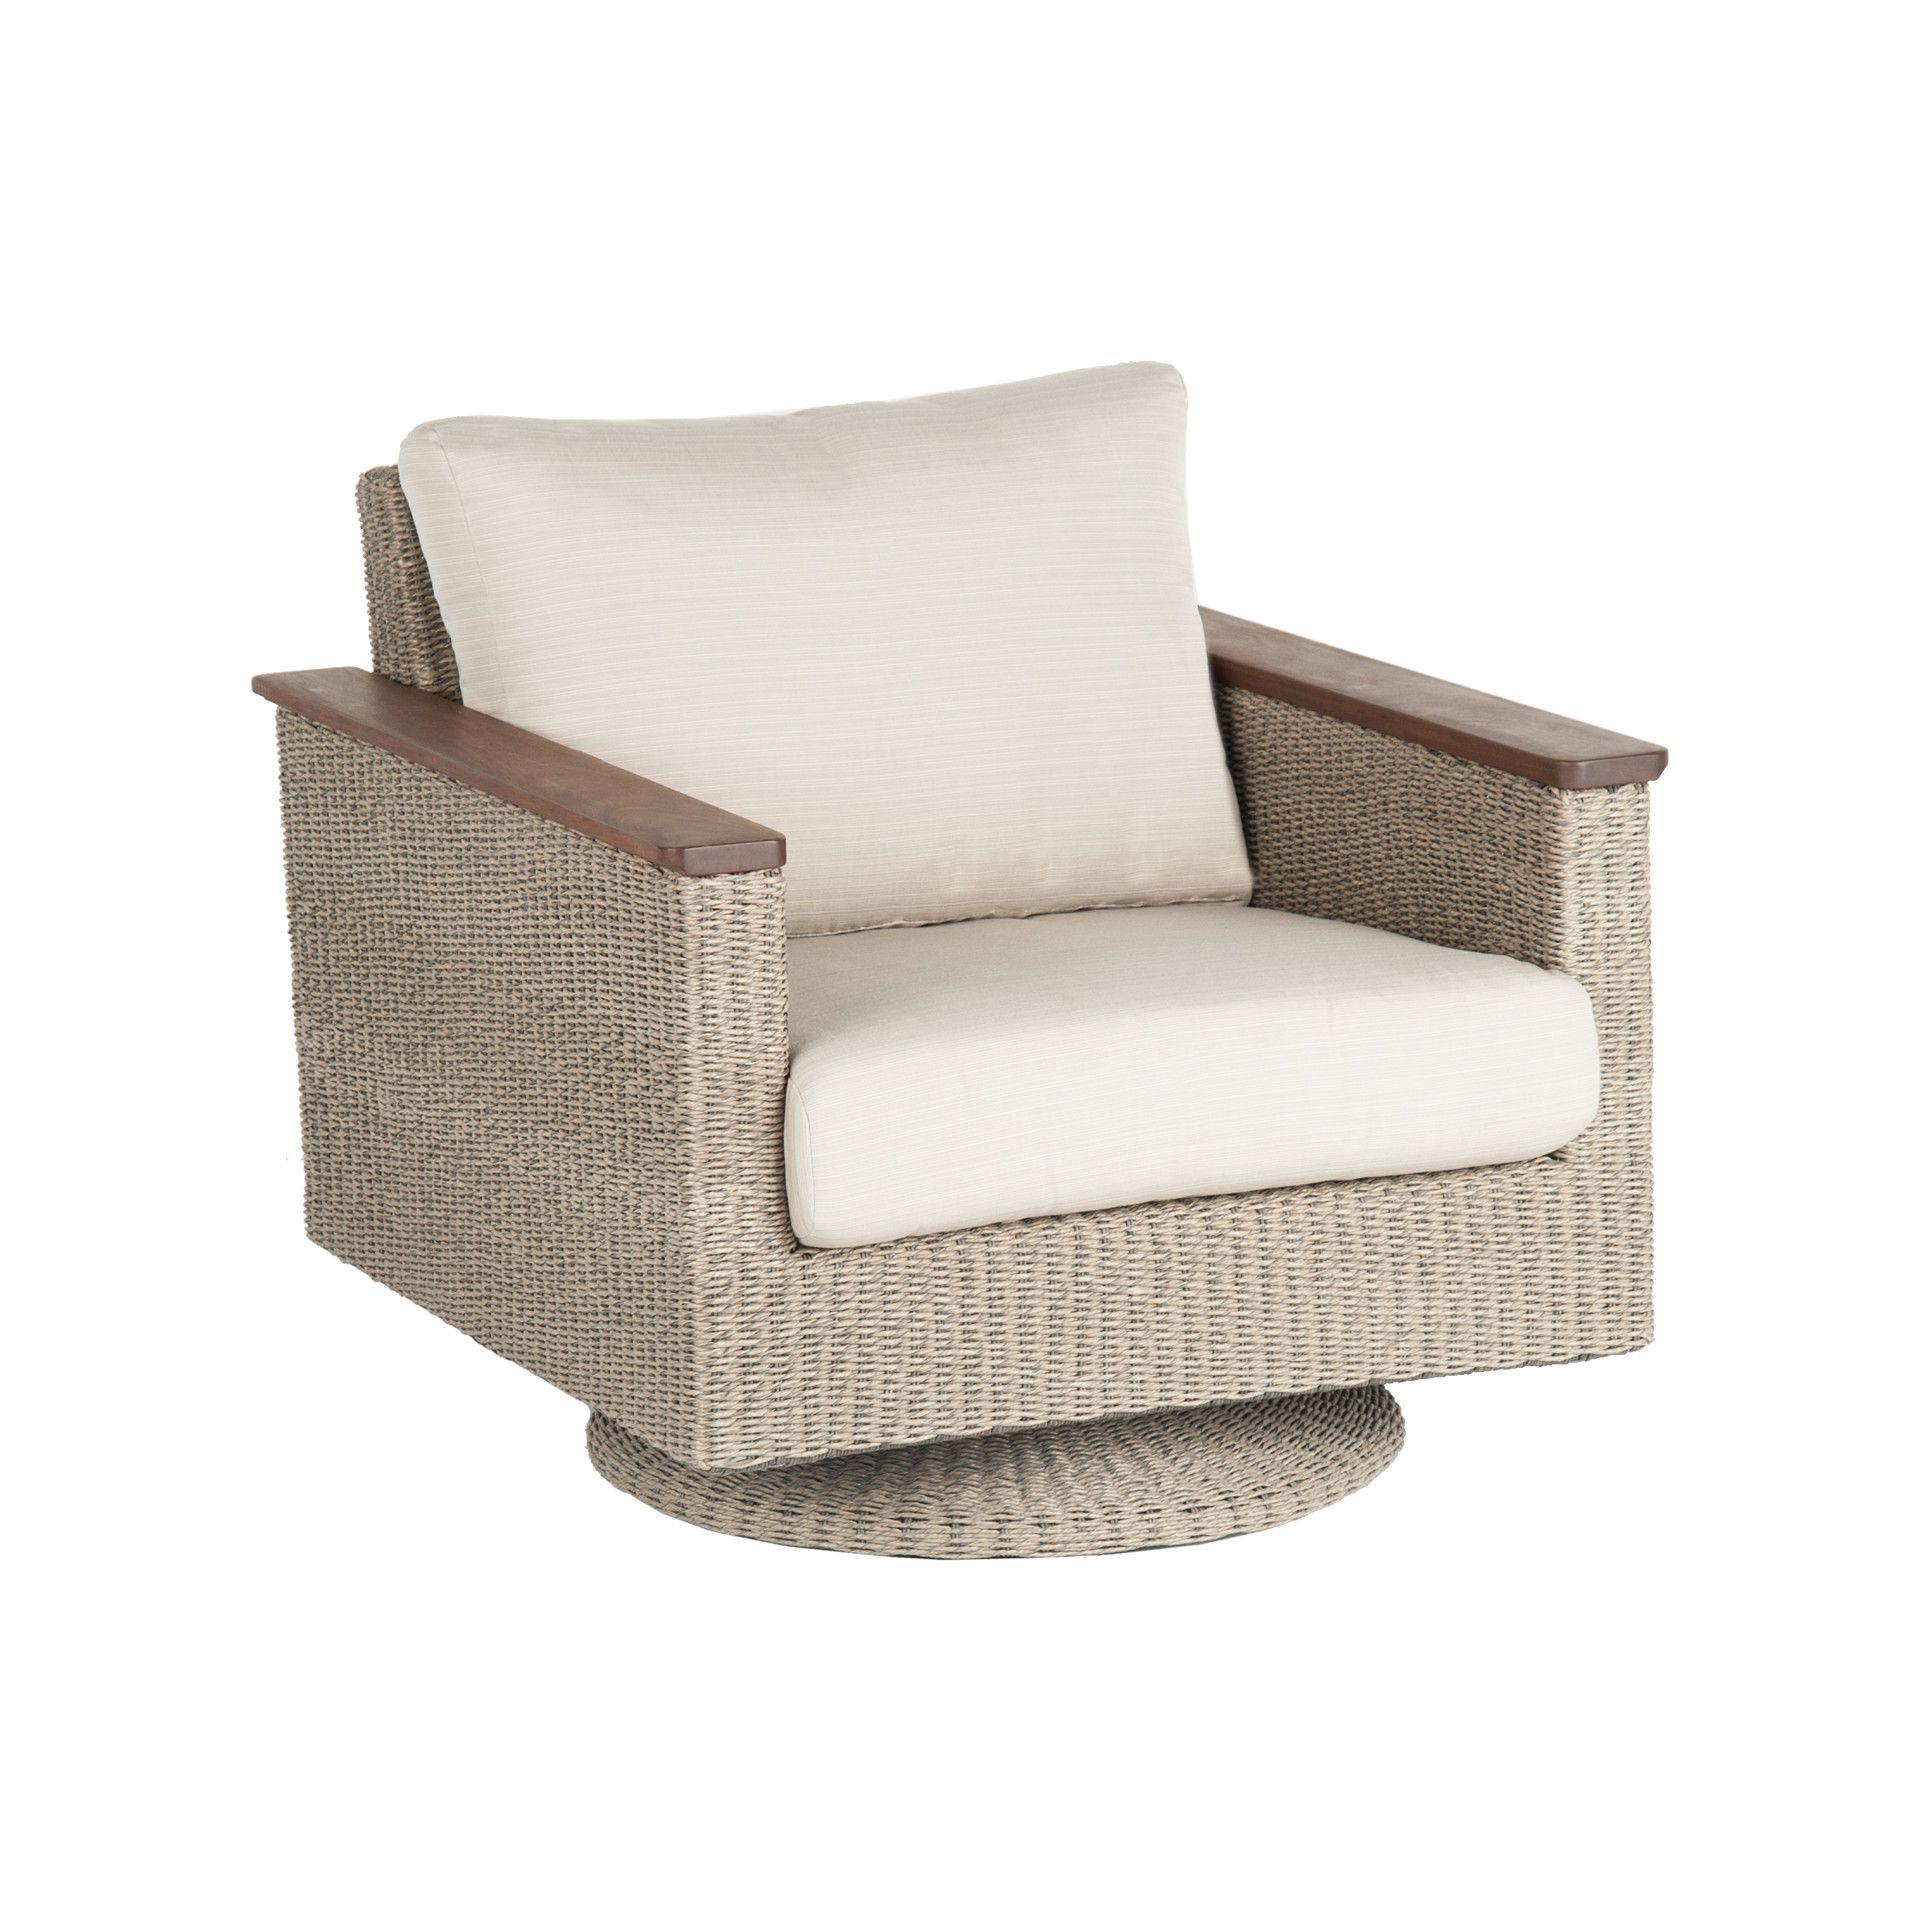 Jensen Leisure C Swivel Rocker Universal Patio Furniture Studio City Ca